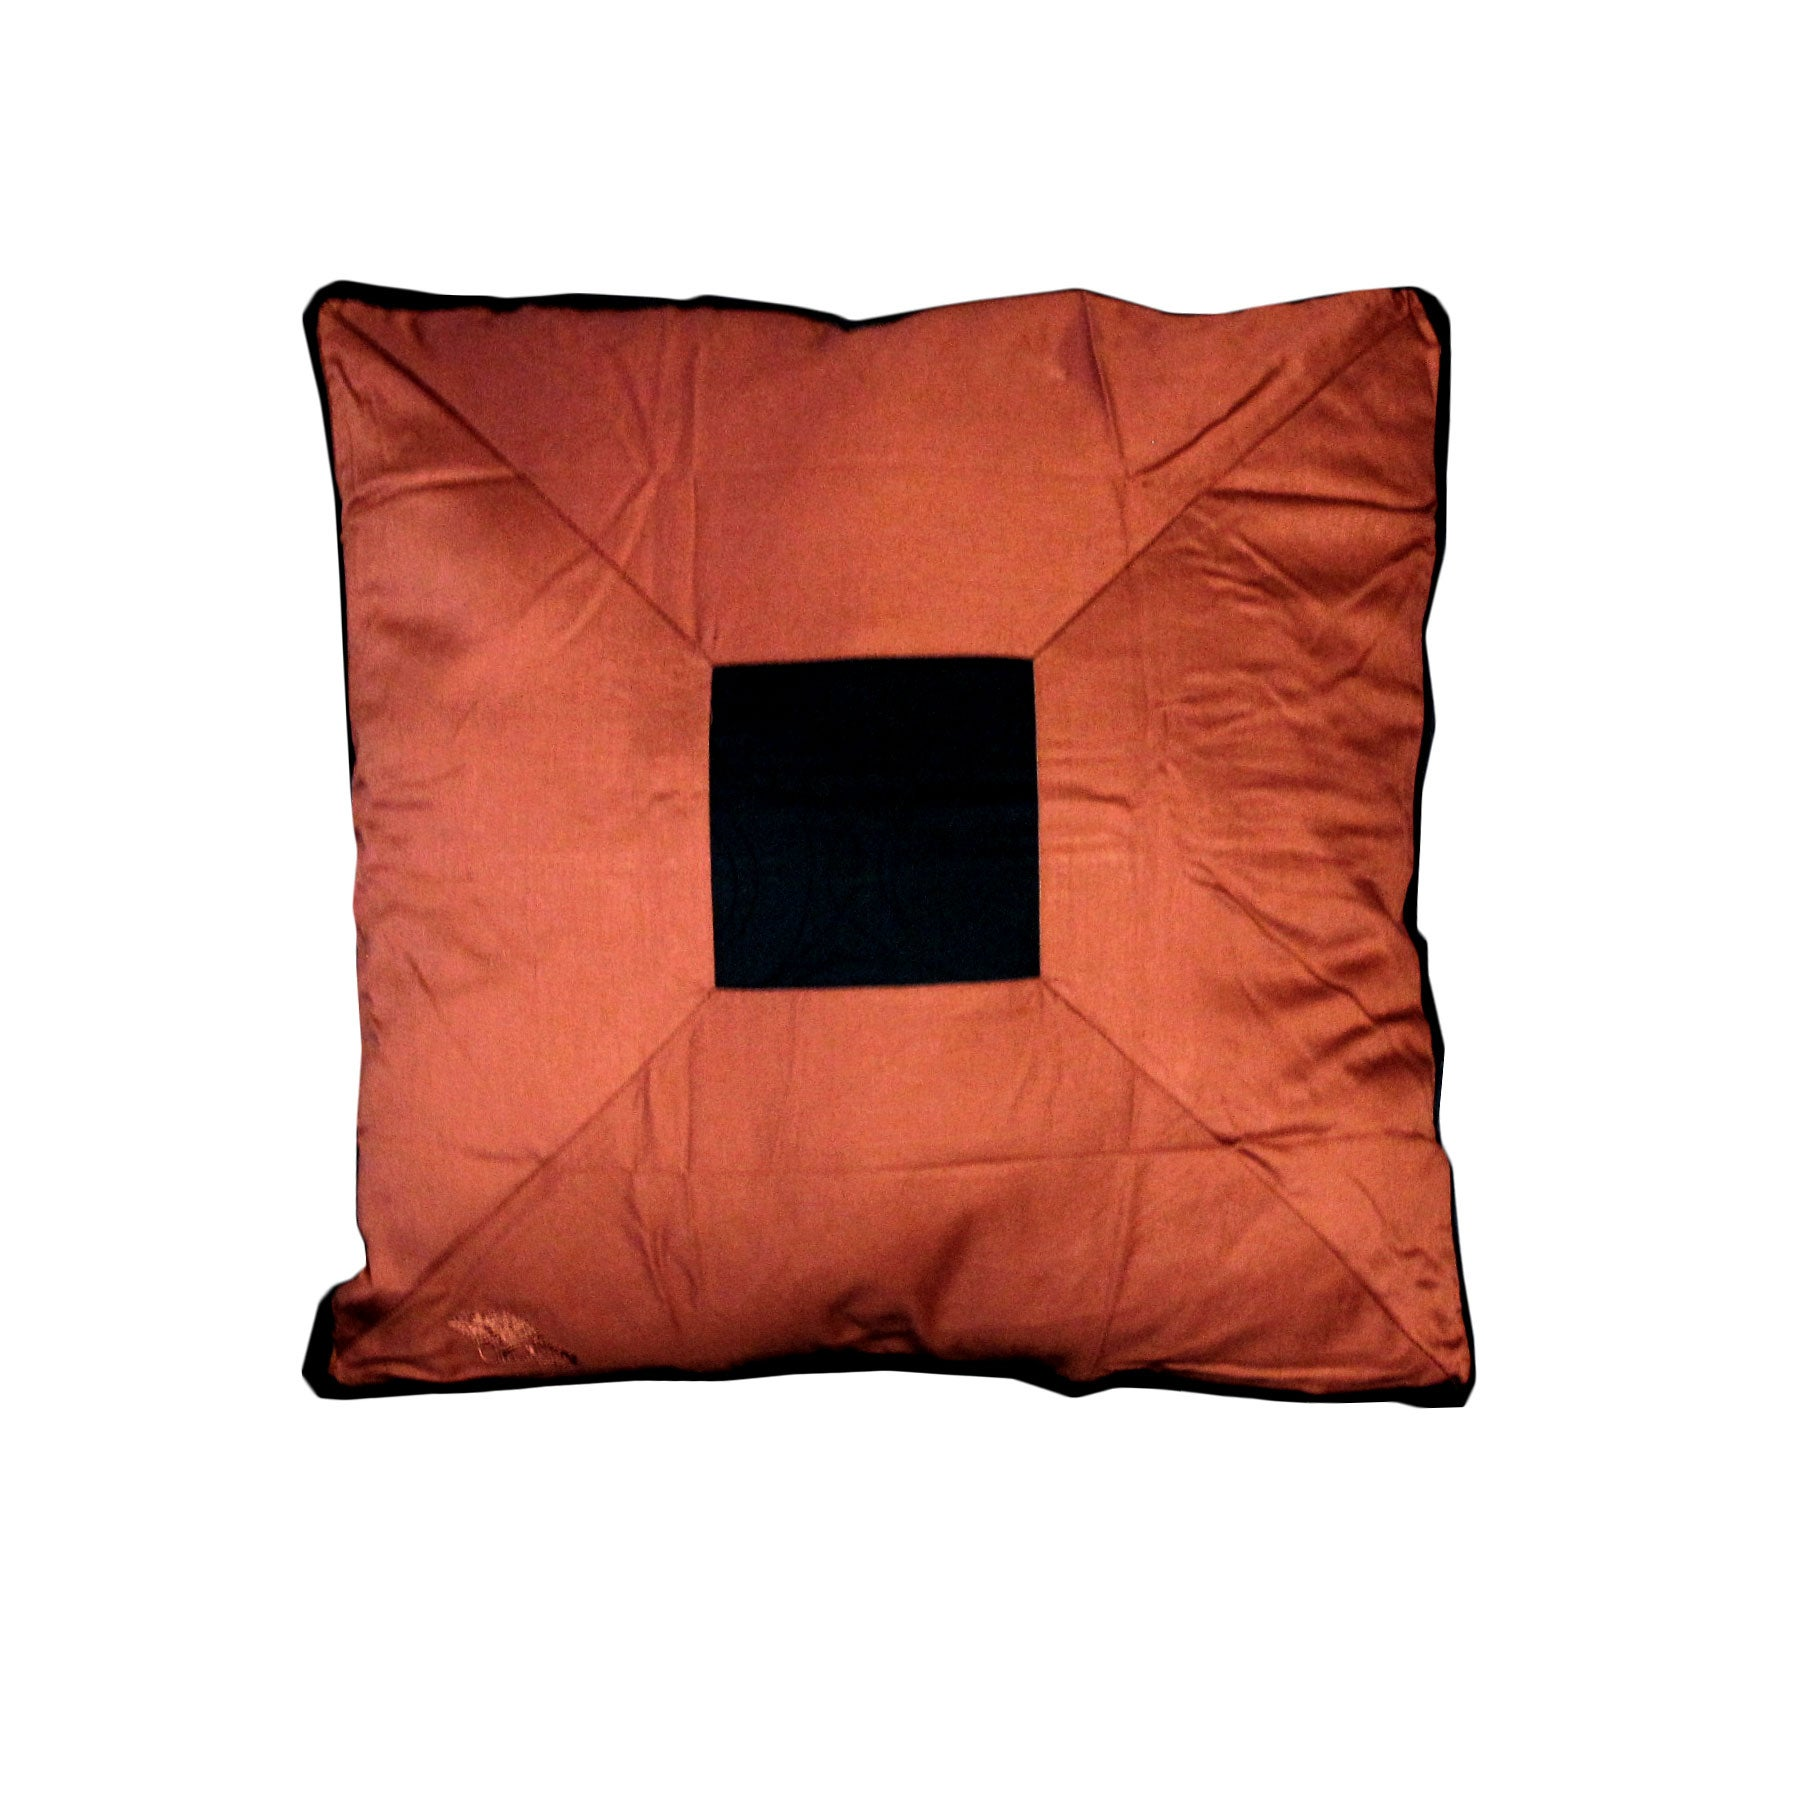 Venucci Cushion Cover